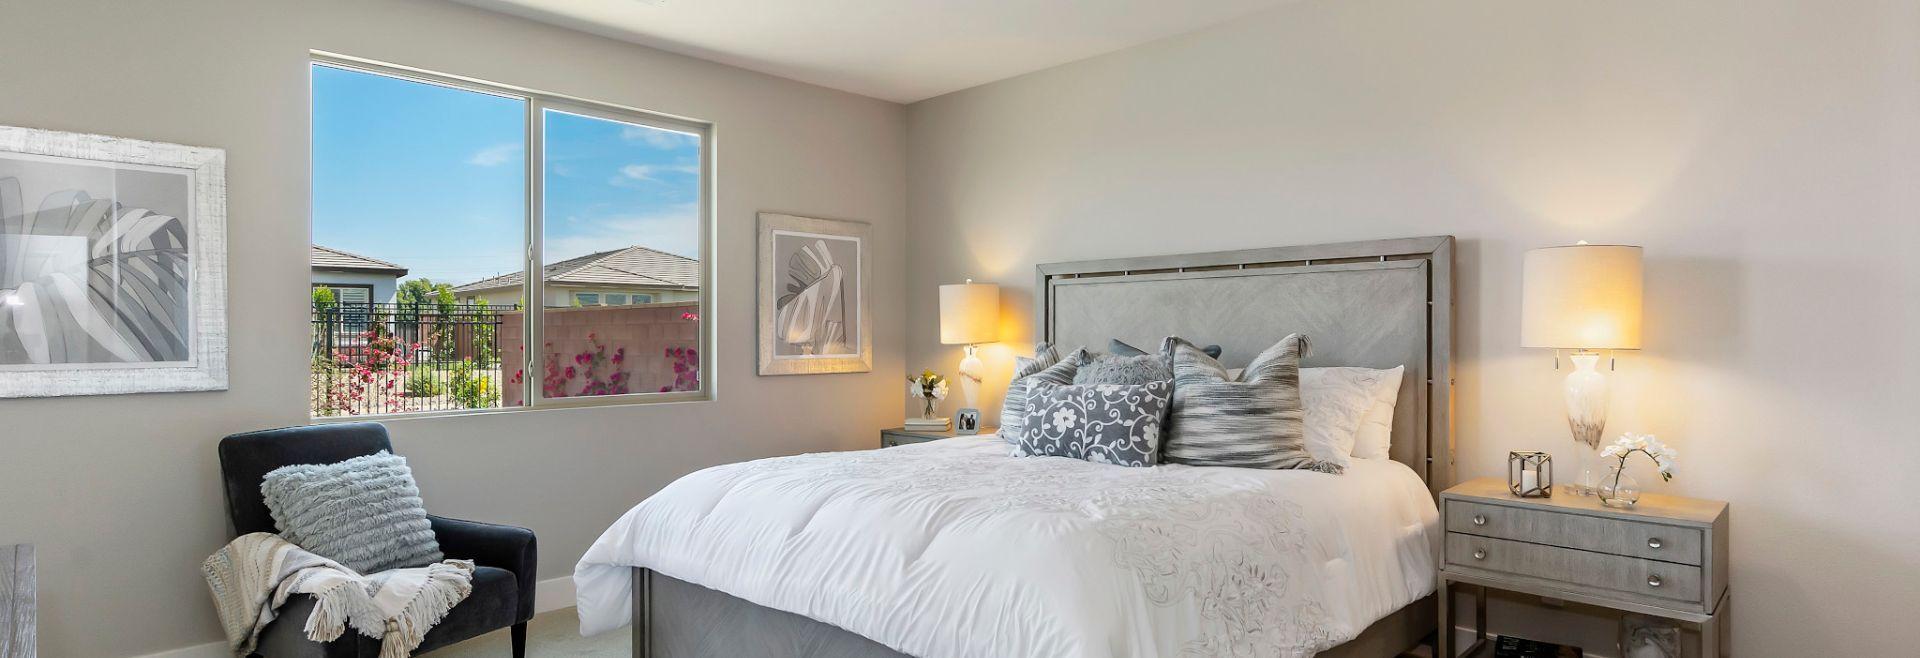 Trilogy Polo Club Unite Master Bedroom: Unite Master Bedroom